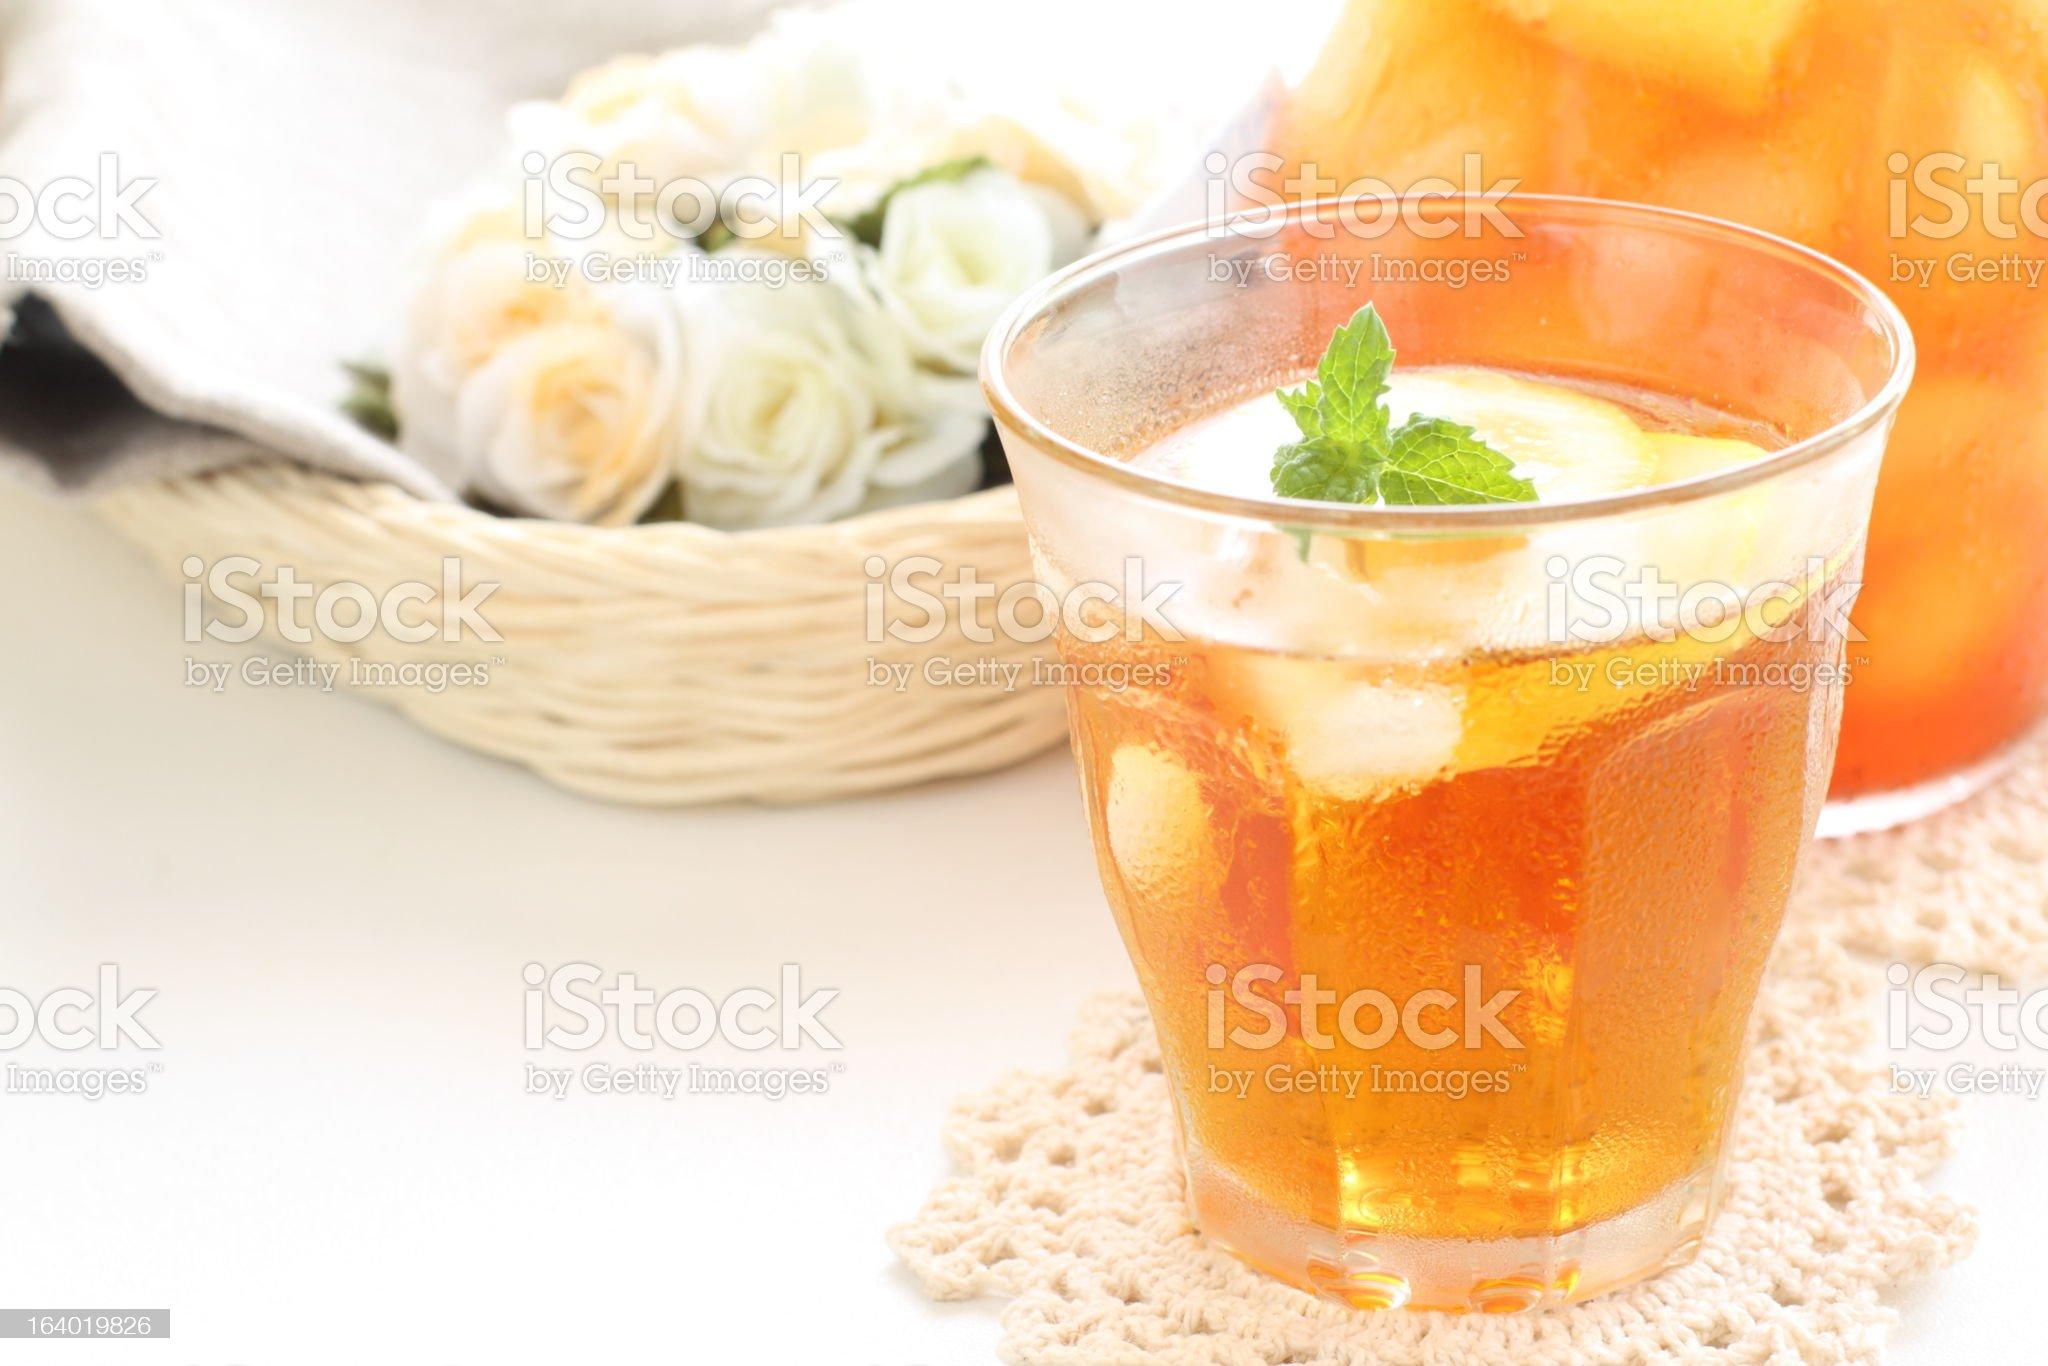 Iced mint tea royalty-free stock photo